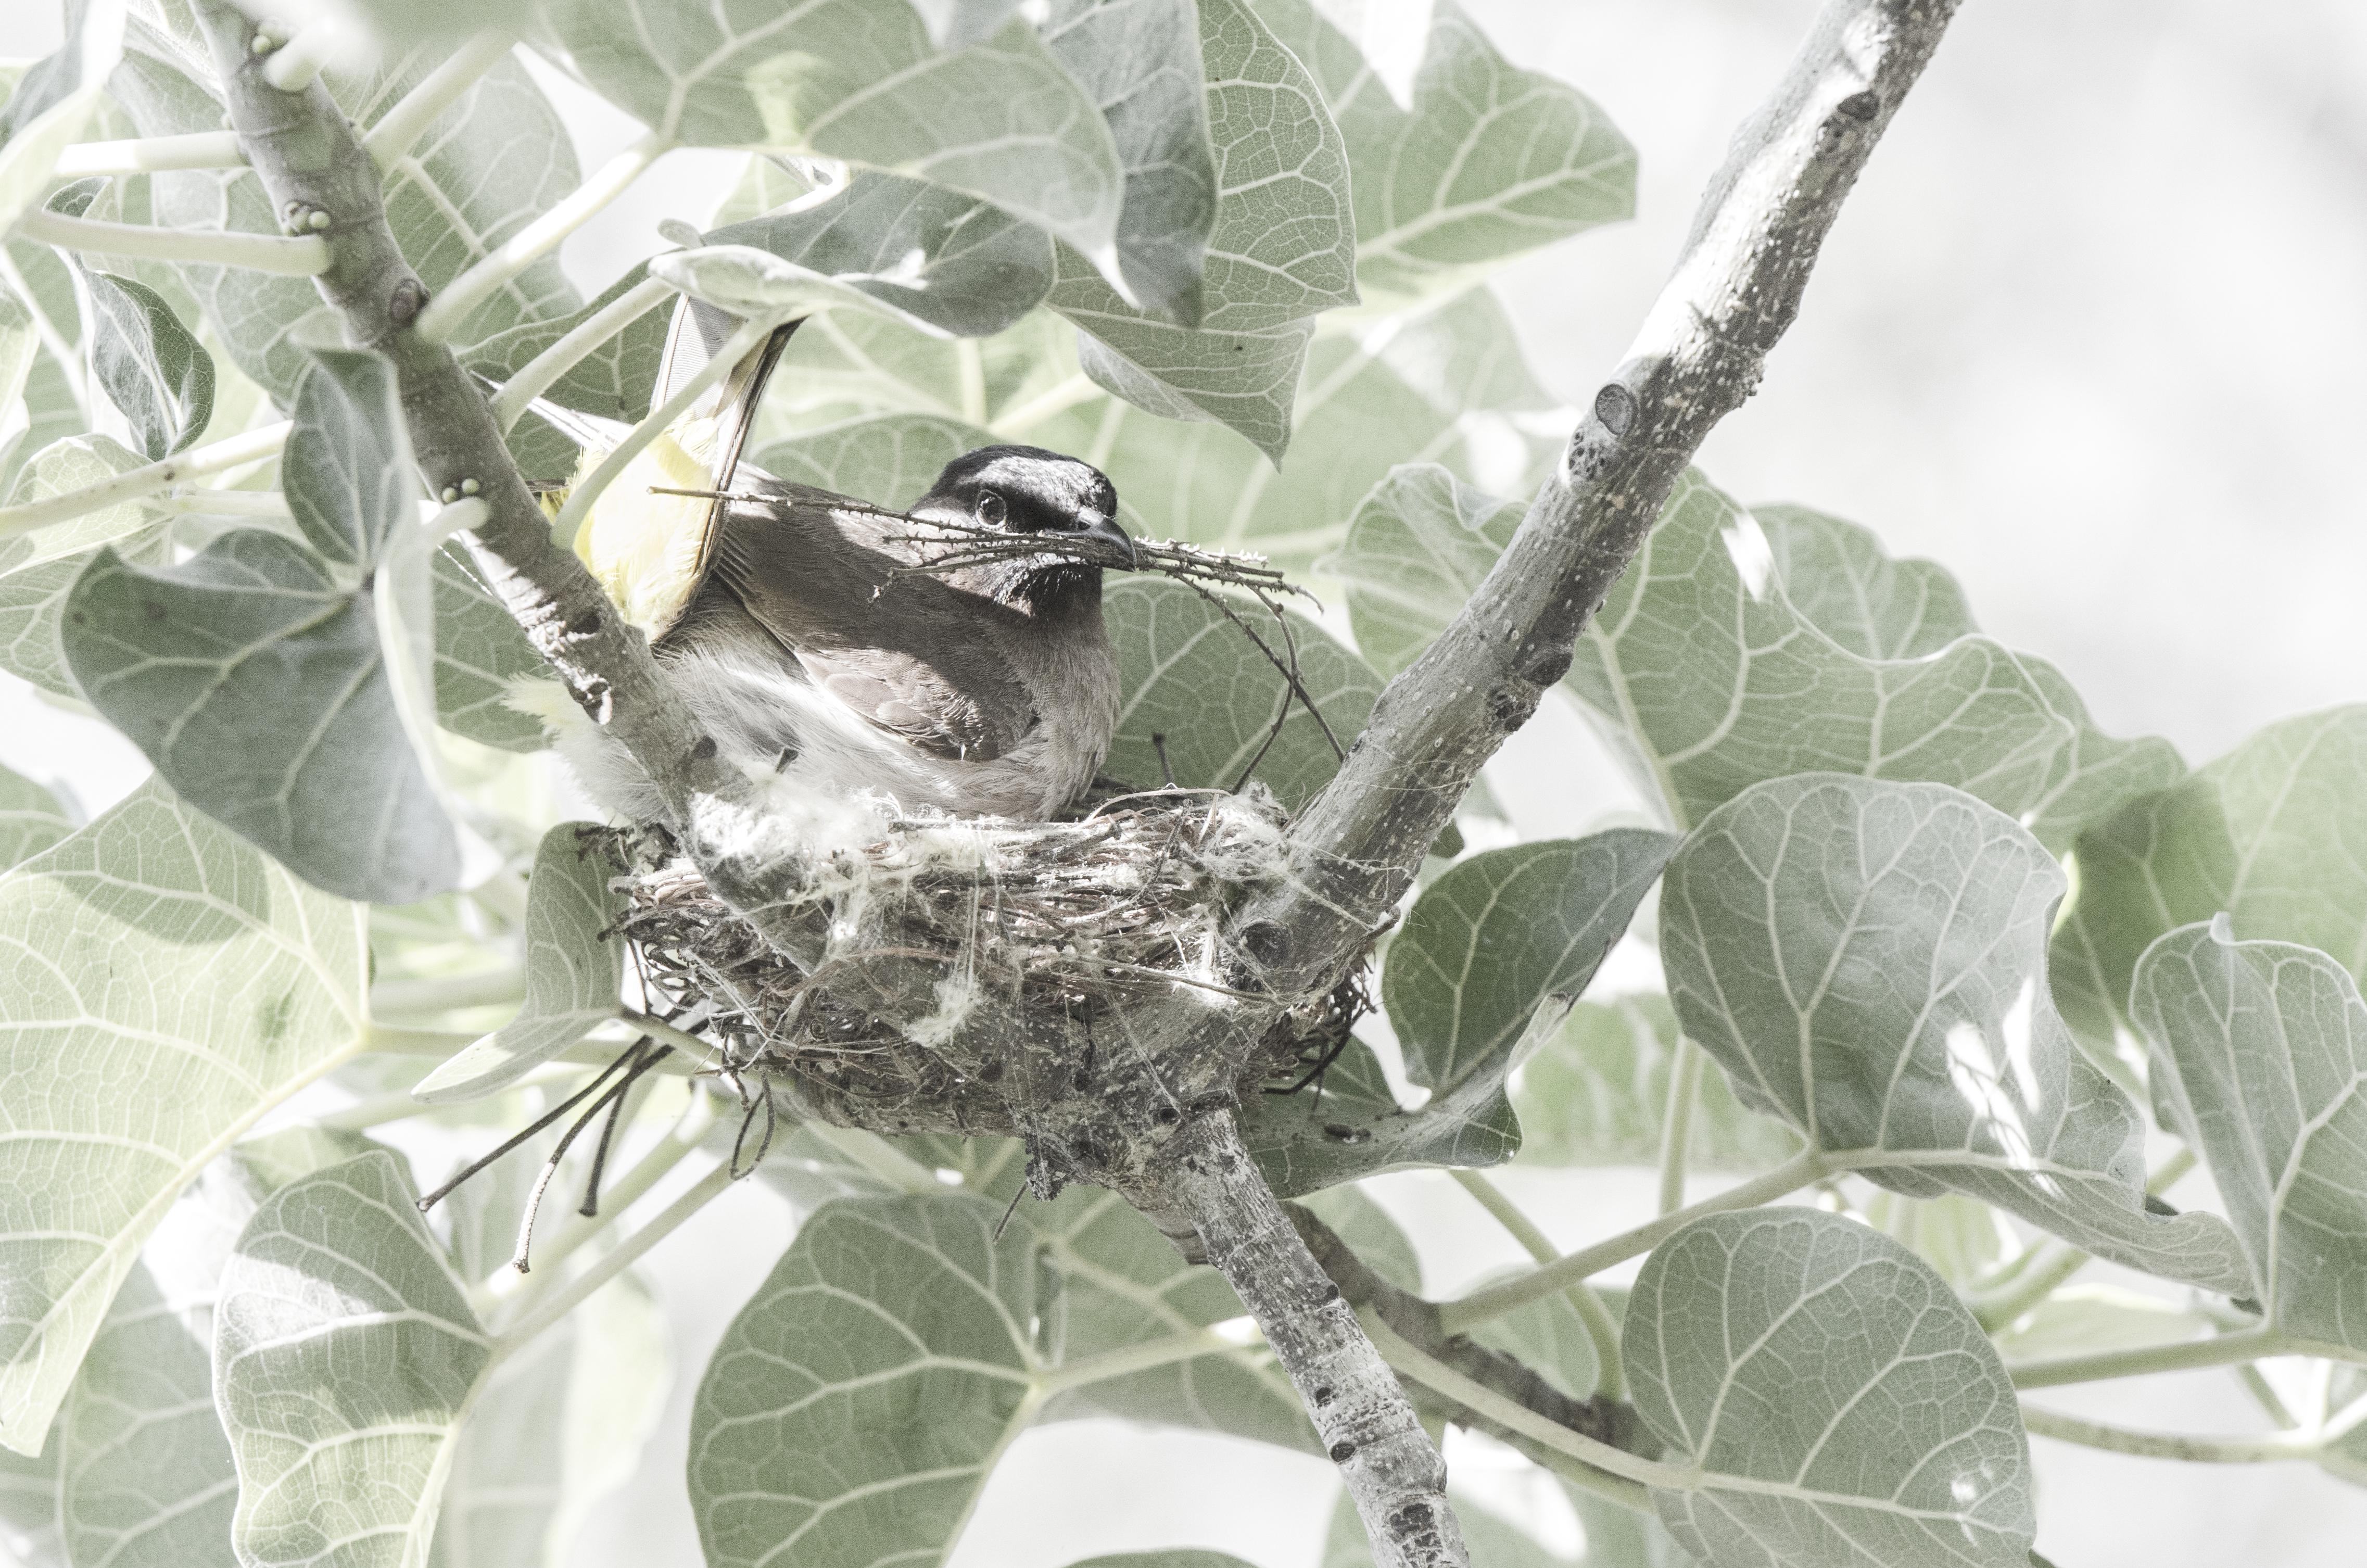 Bulbul Nesting final_DSC6869